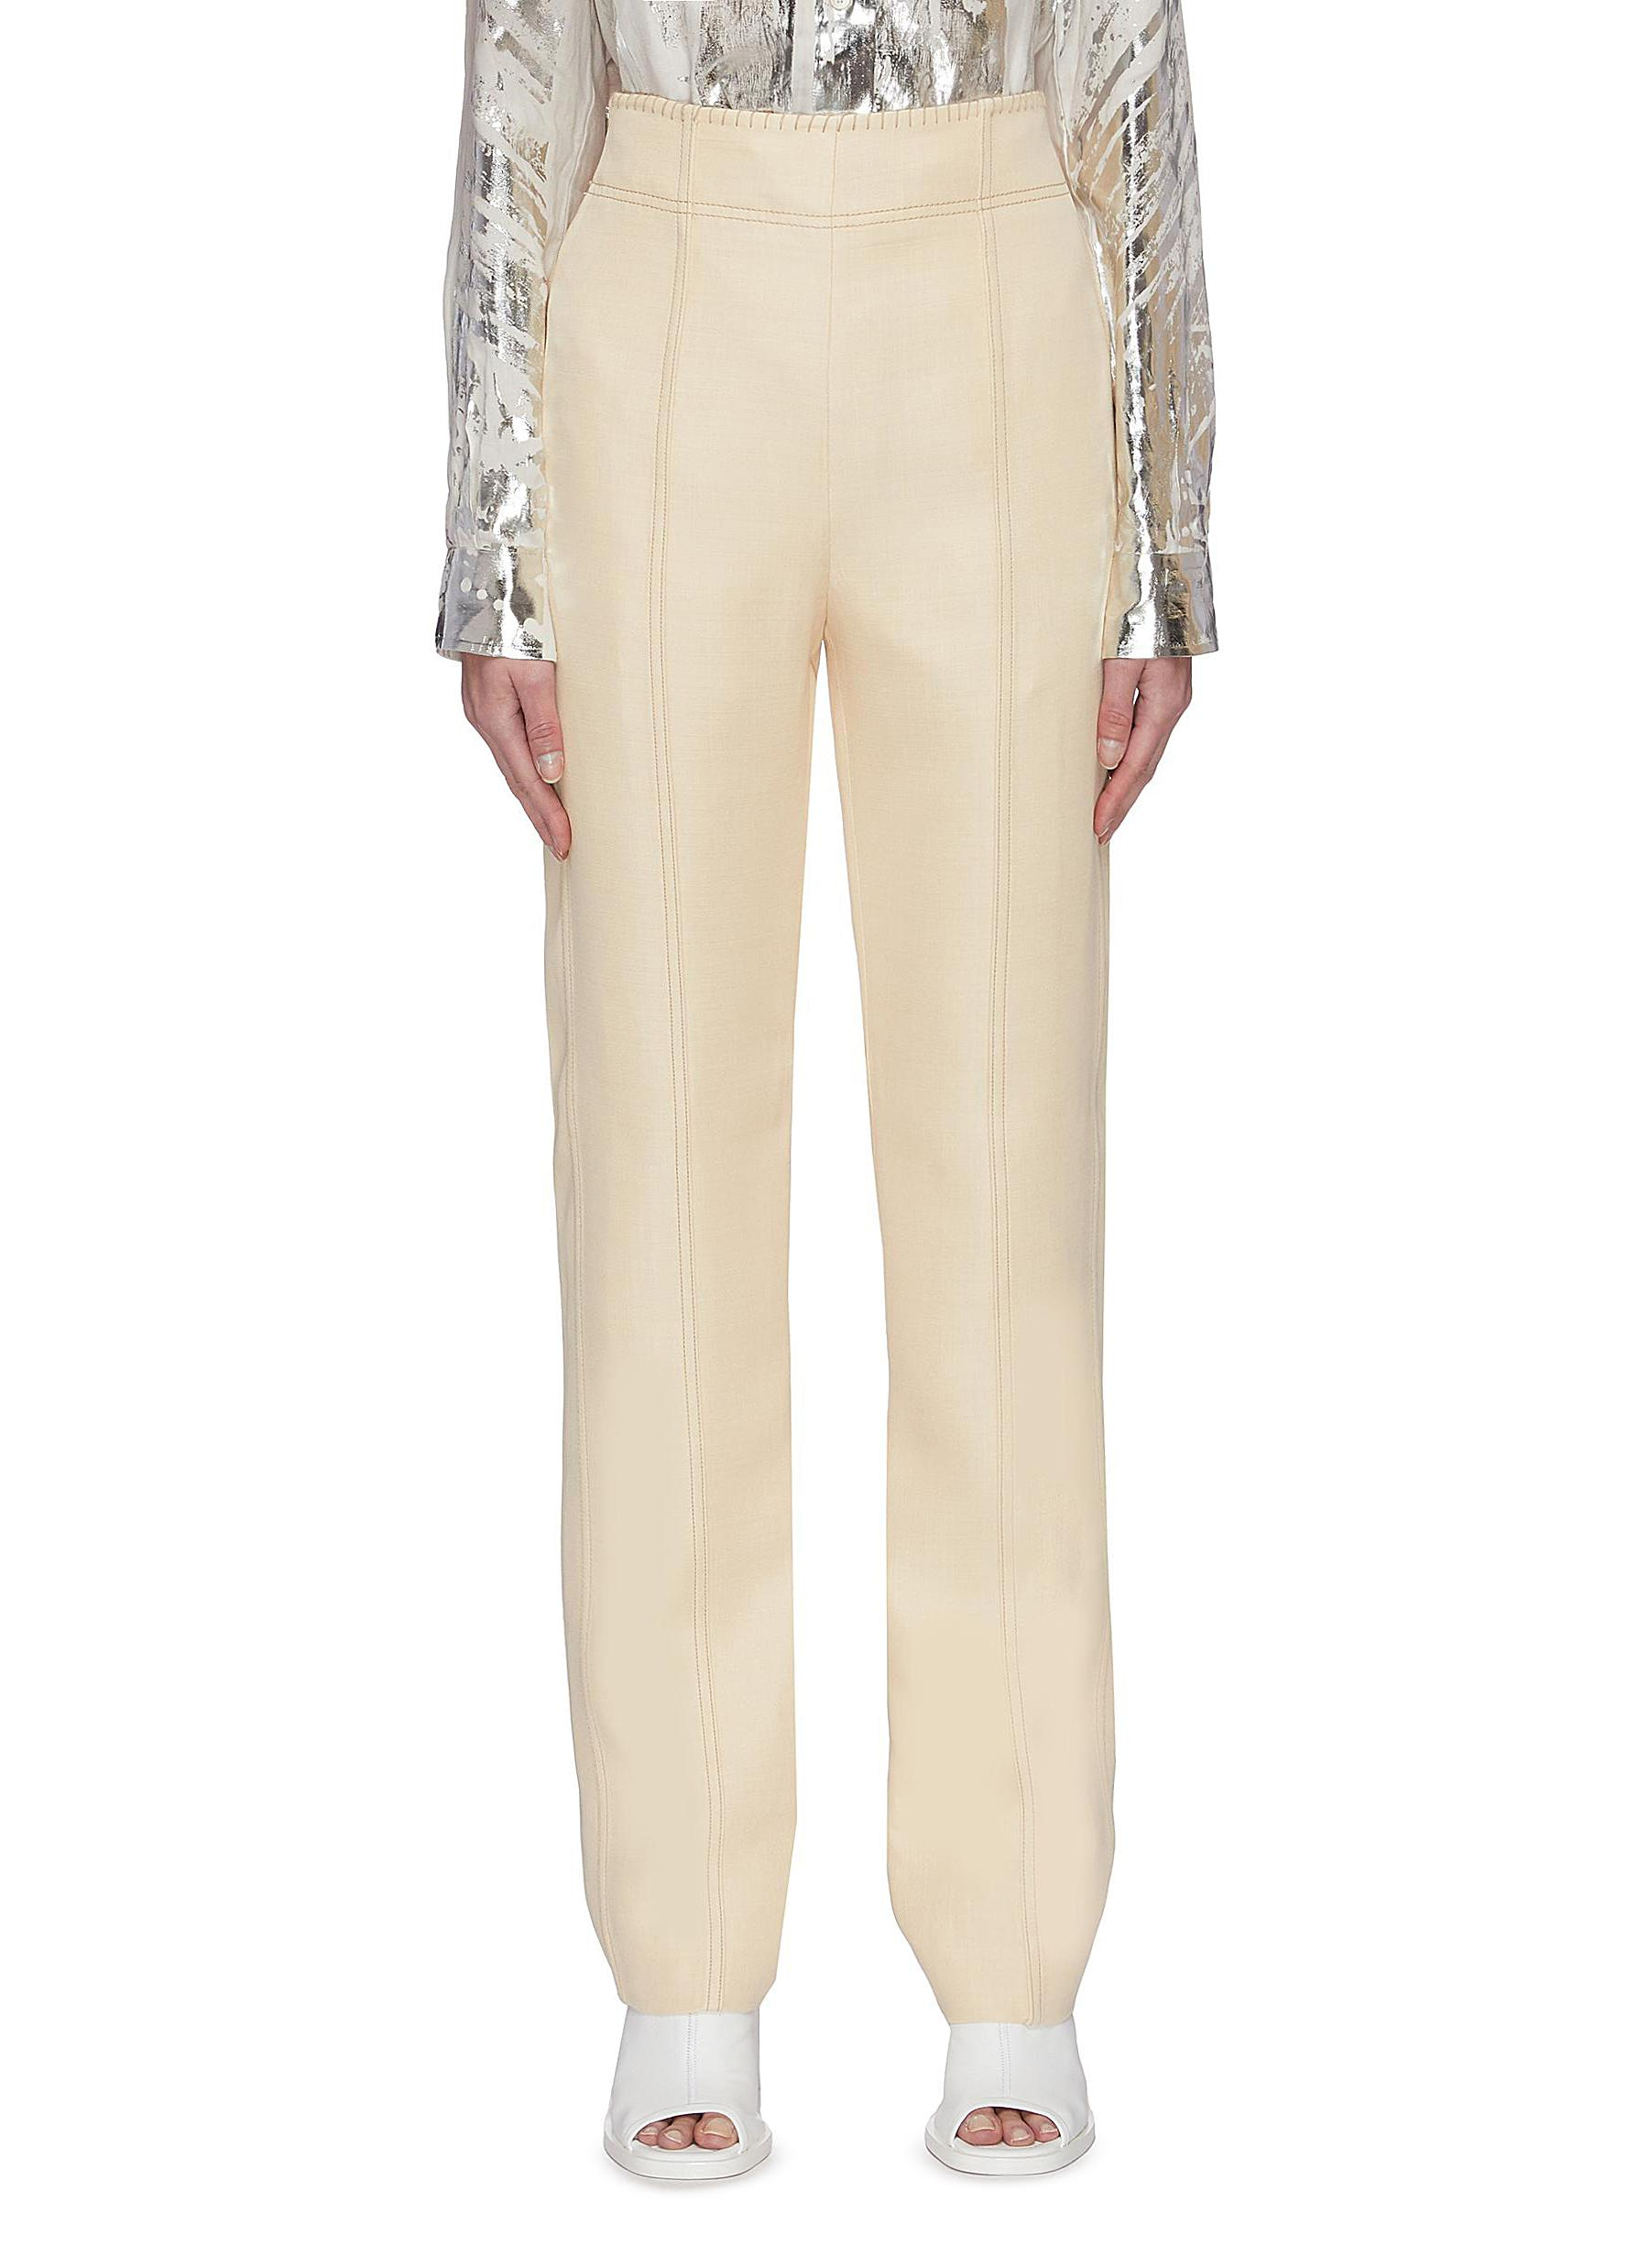 Buy Acne Studios Pants & Shorts Contrast-stitch pants